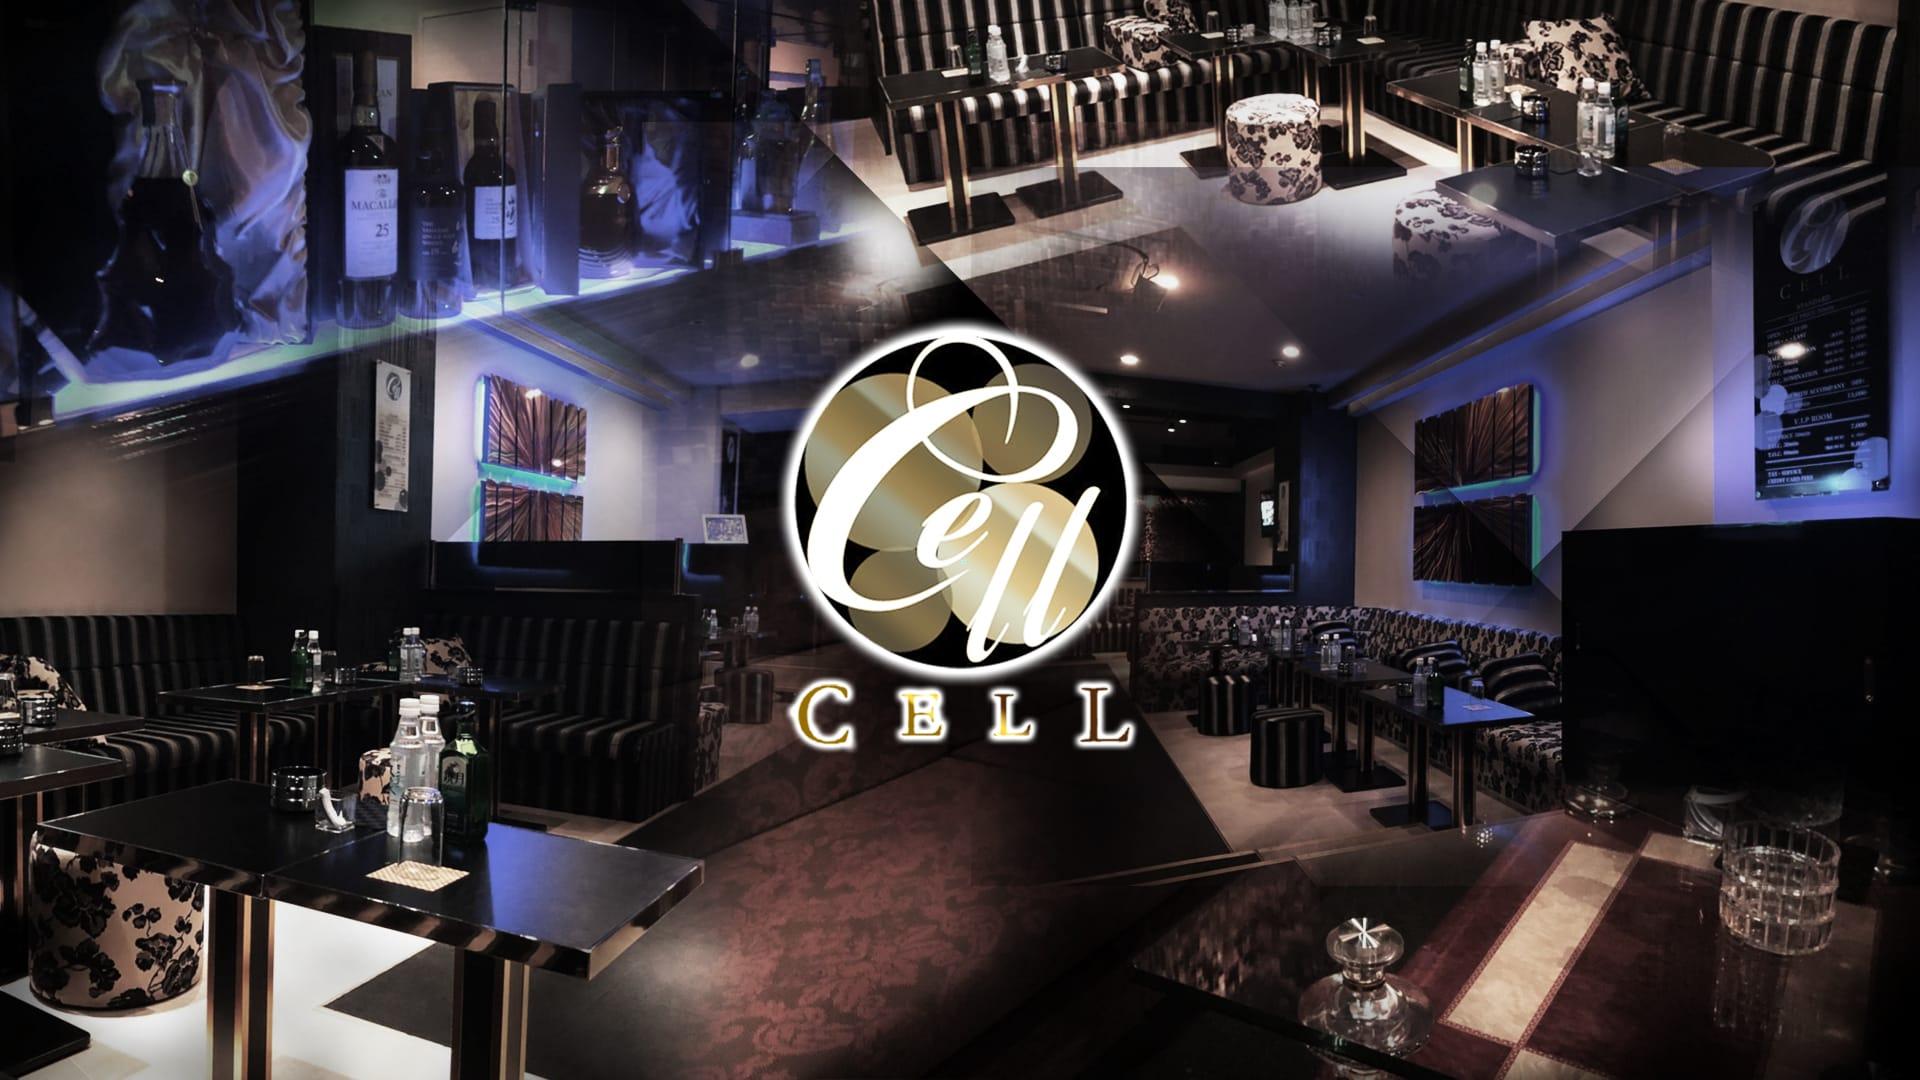 Club CELL(セル) 府中キャバクラ TOP画像